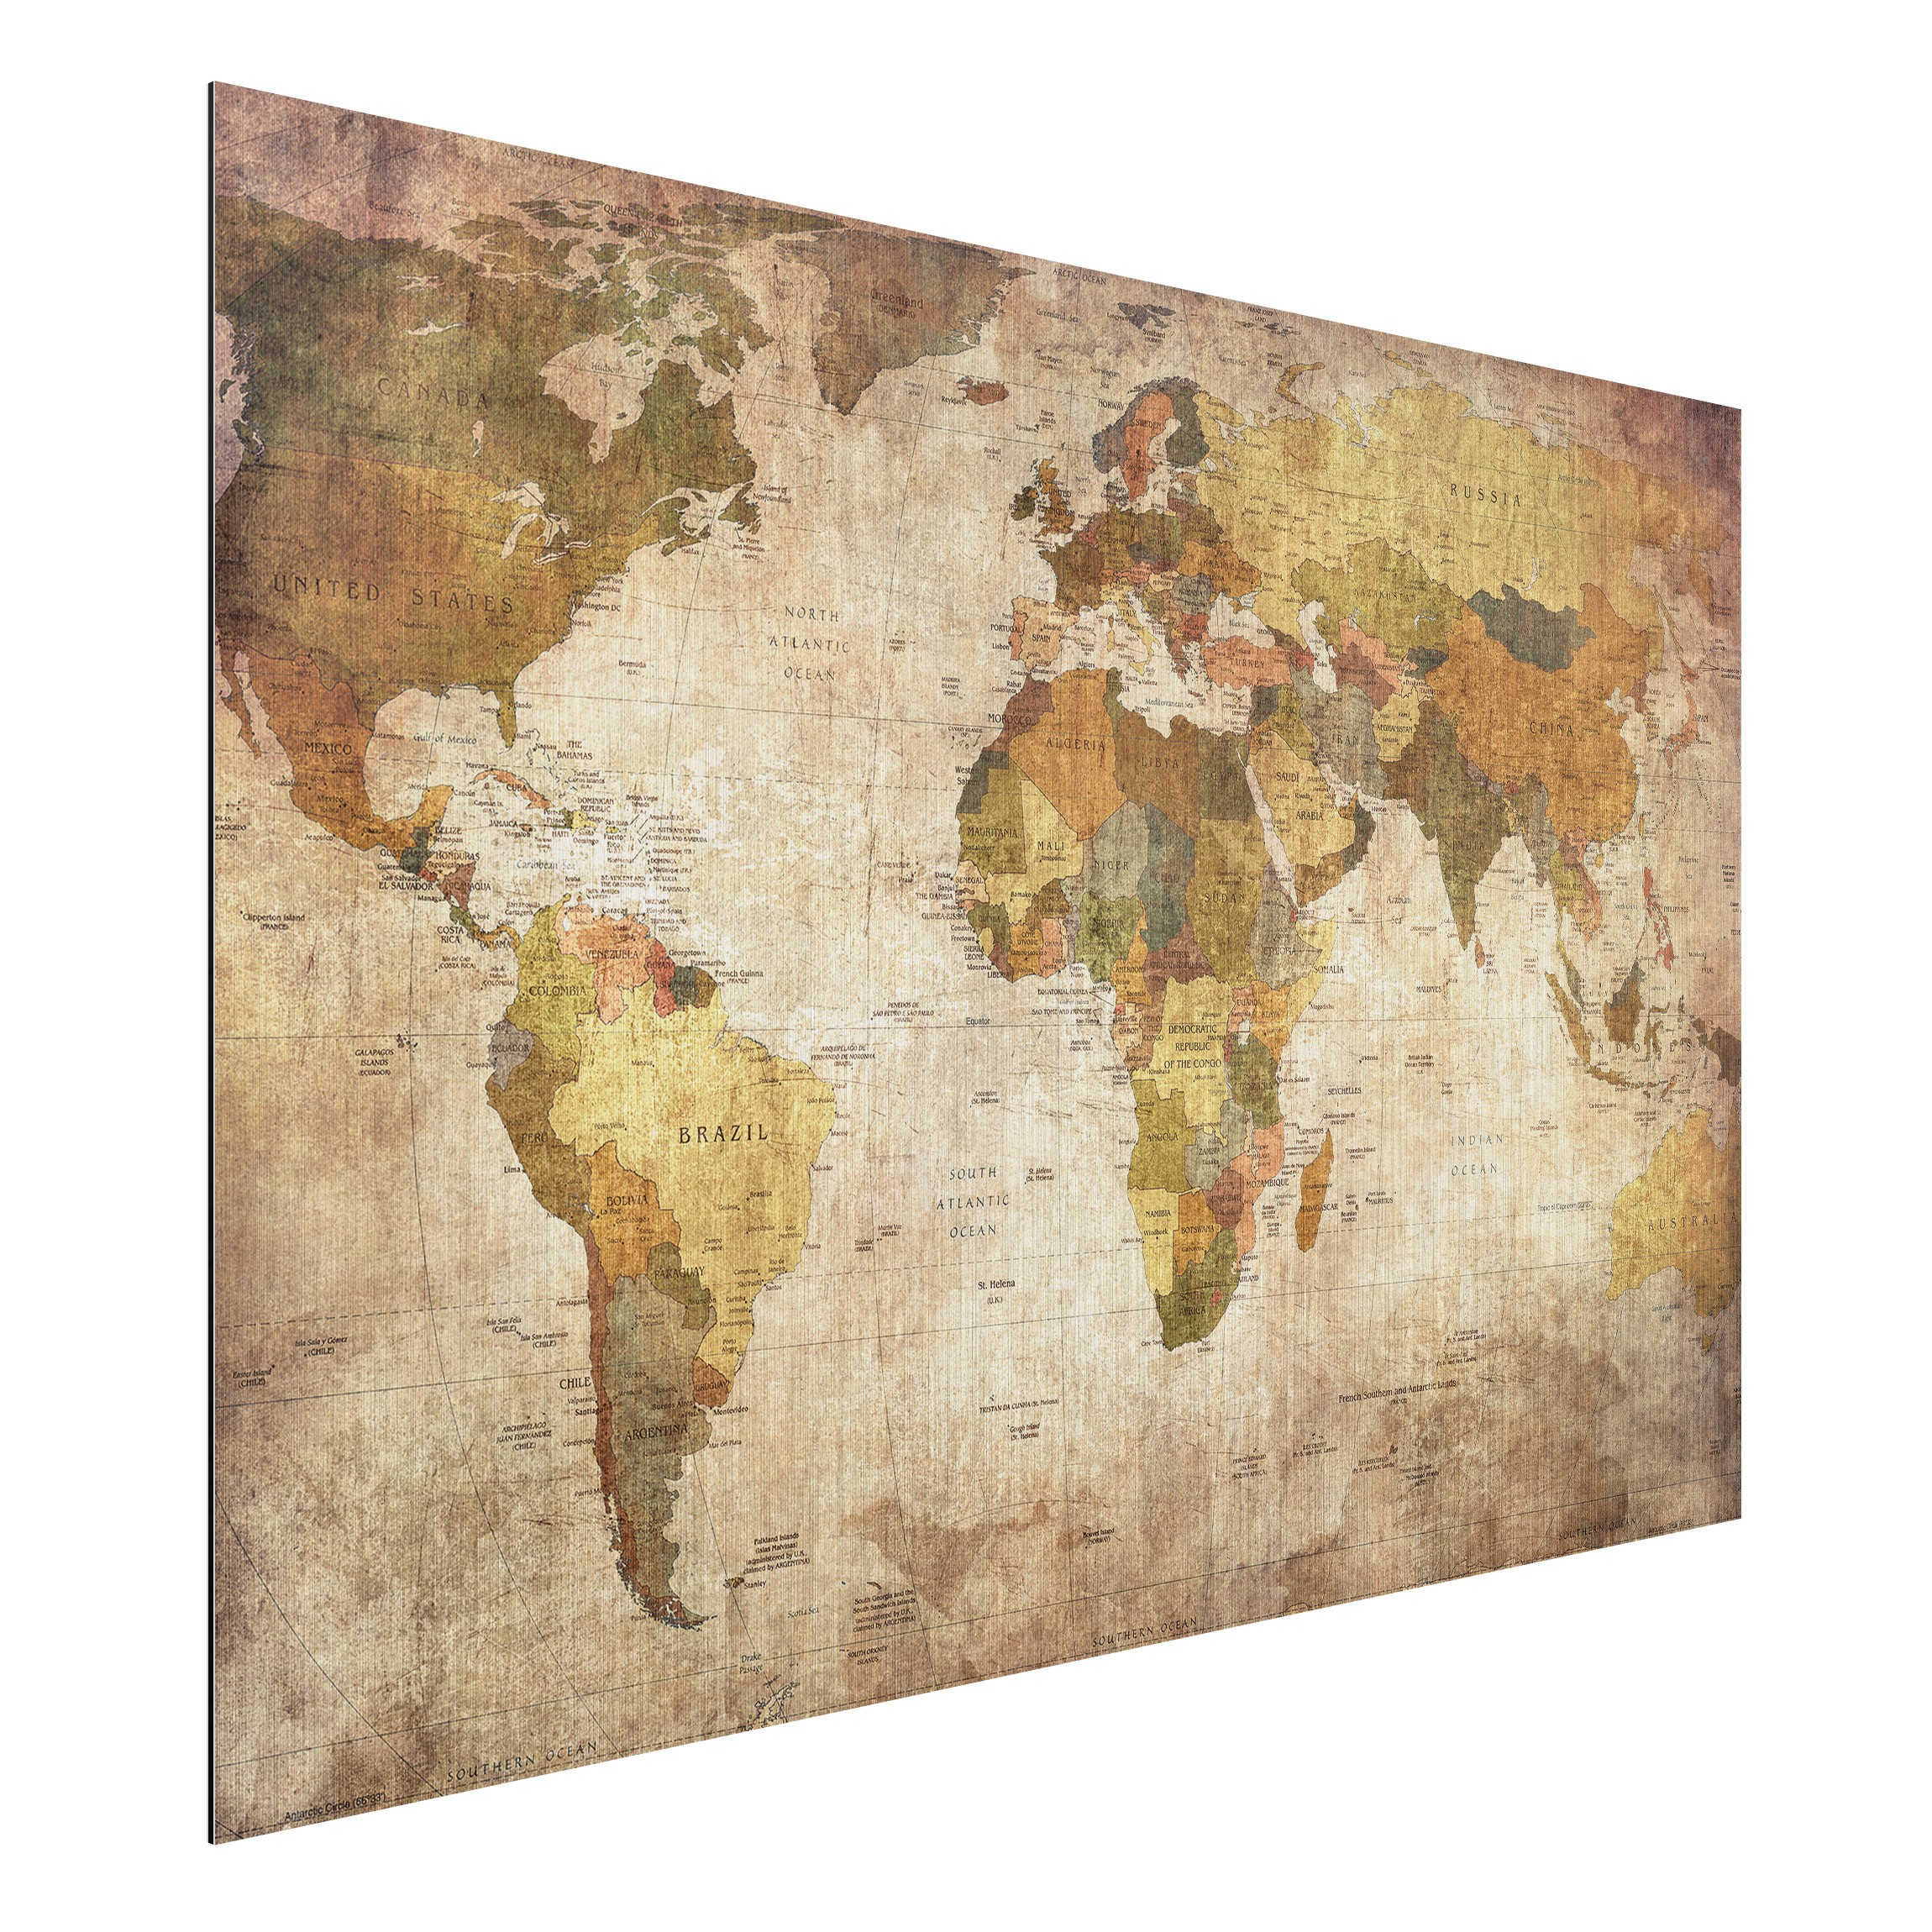 wandbild weltkarte Aluminium Print gebürstet   Wandbild Weltkarte   Quer 2:3 wandbild weltkarte